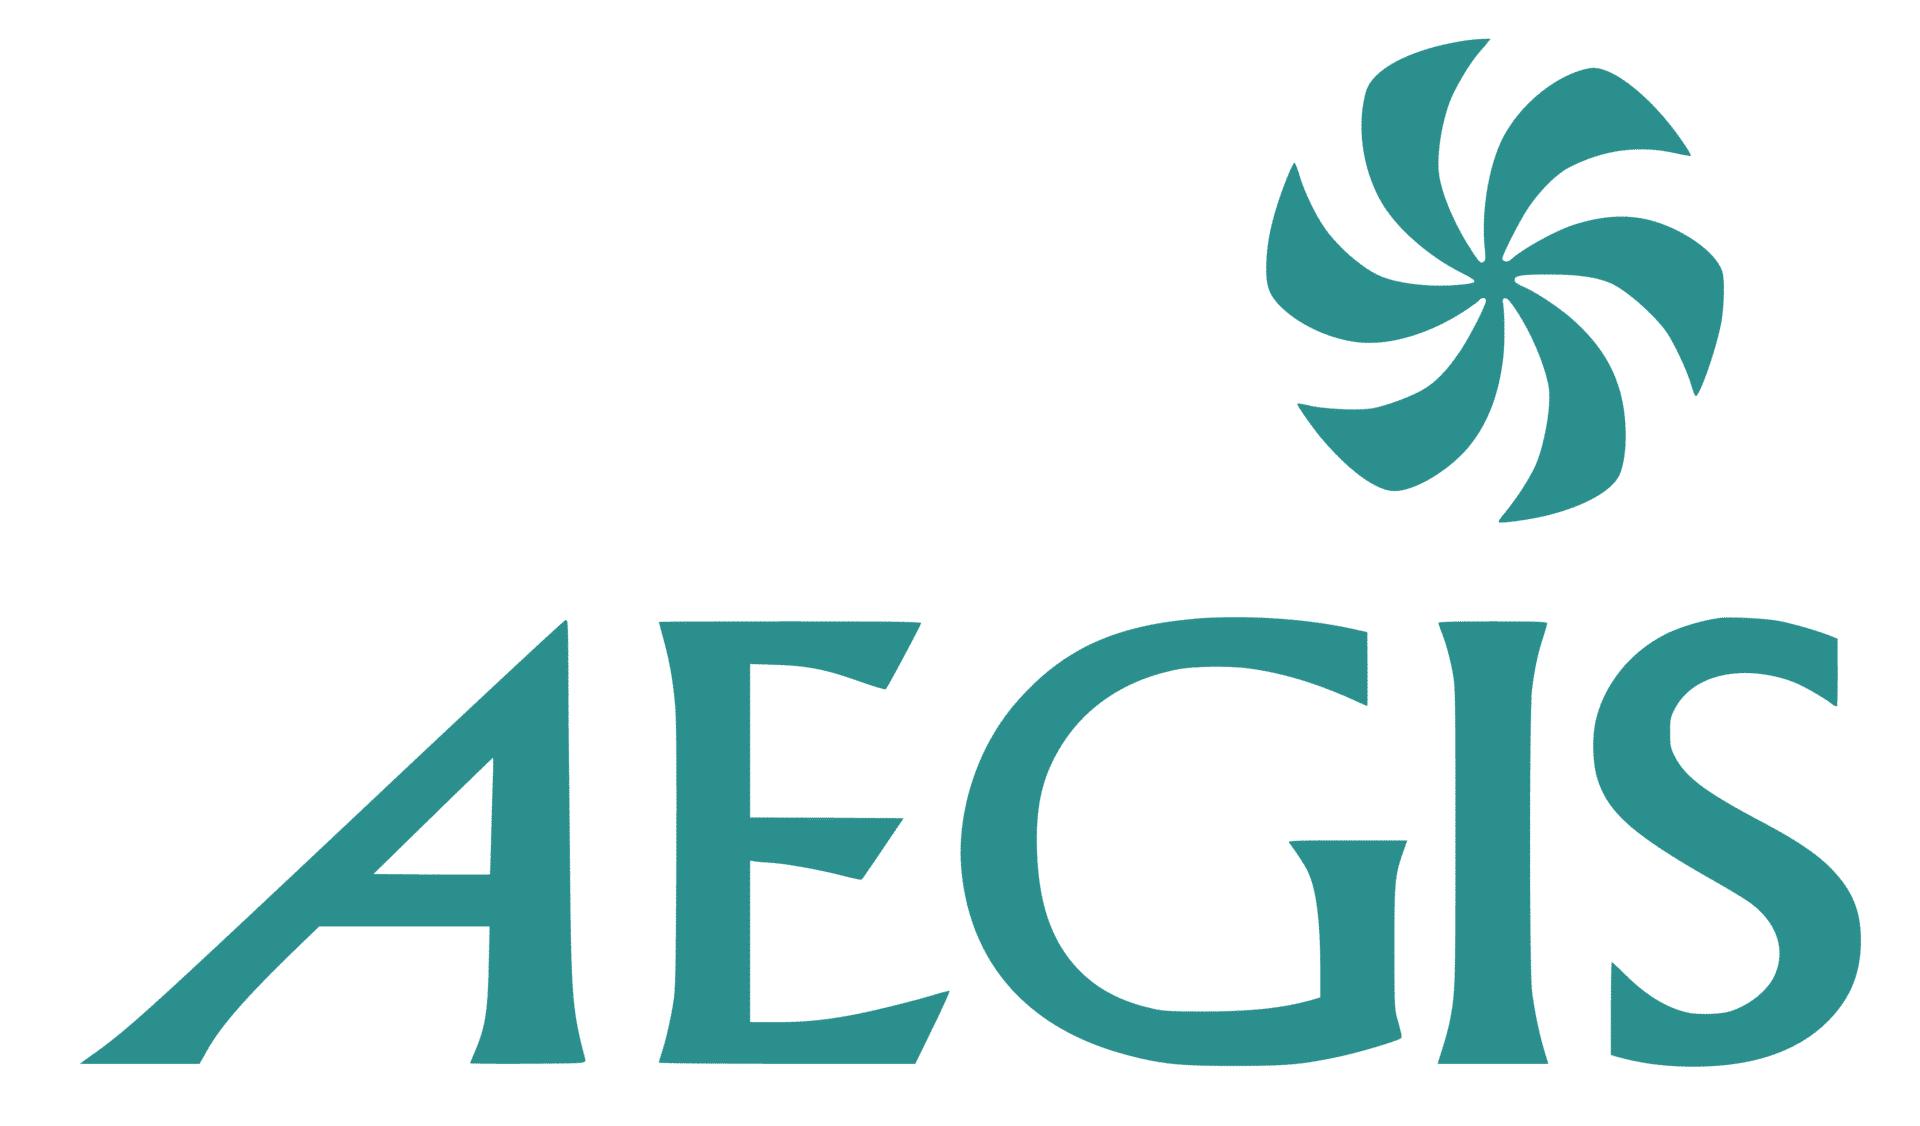 AEGIS-green-white-back-01-448x249-c-default.png